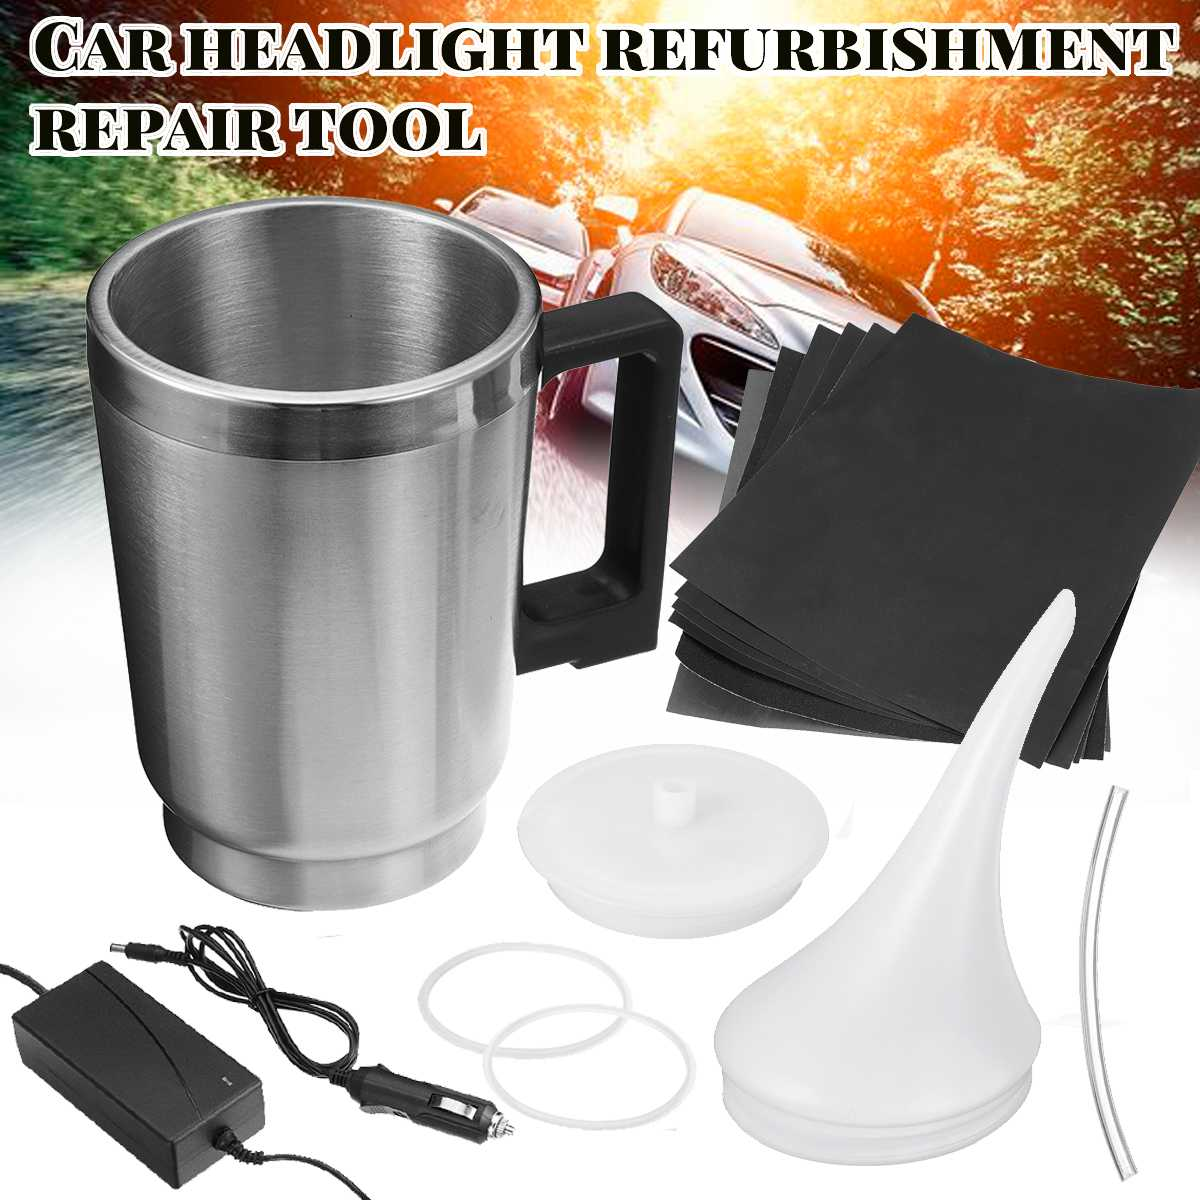 Polishing Headlight Vehicle Car Headlight Repair Accessories Power Supply Car Headlight Refurbished Tool Kit Headlamp Repair